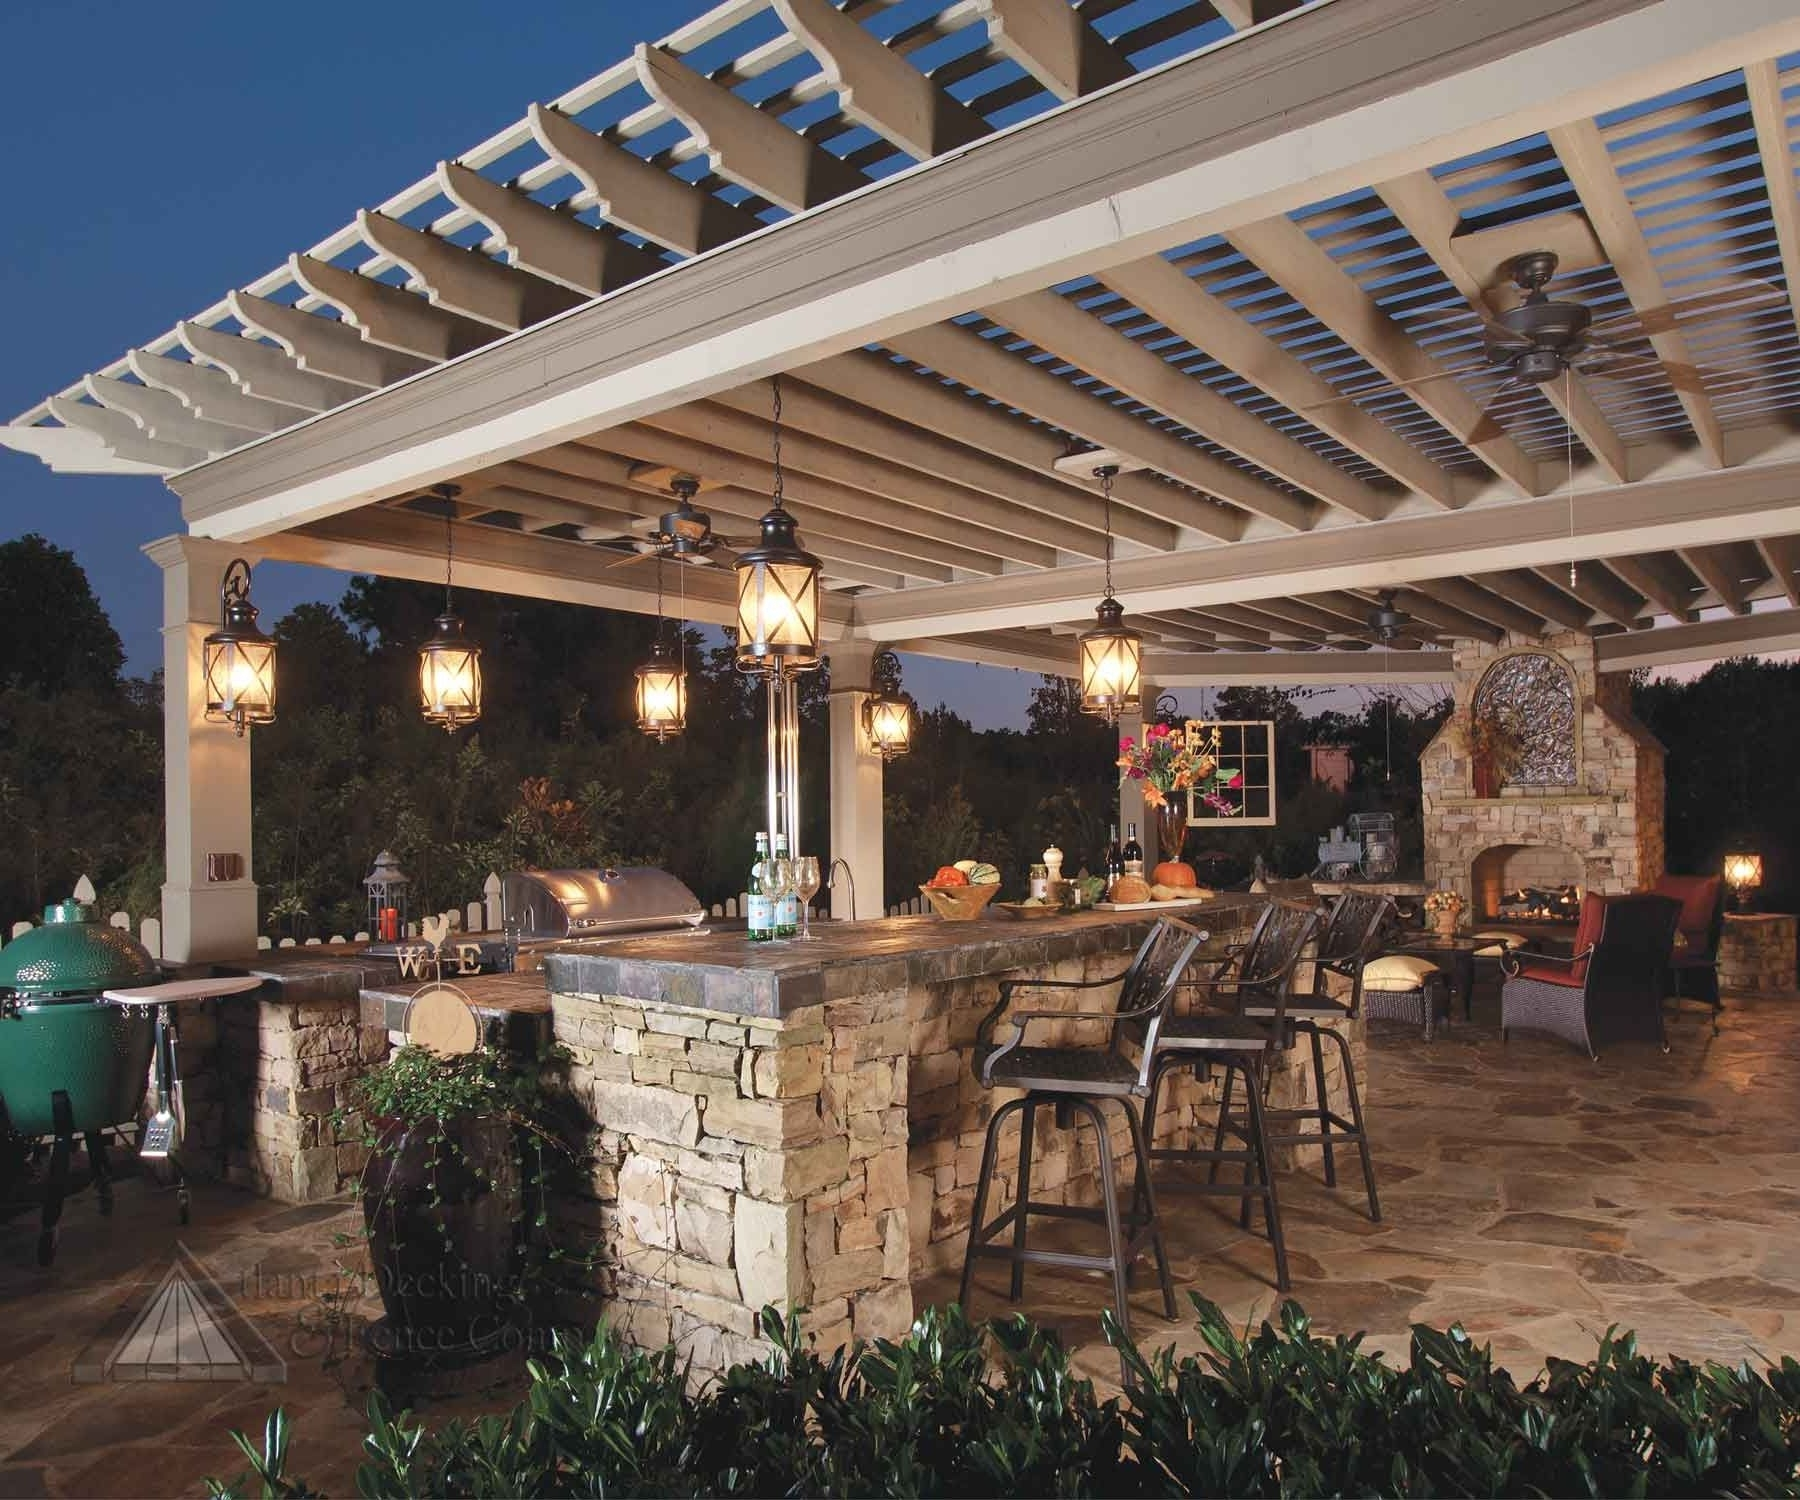 Wayfair Outdoor Hanging Lighting Fixtures For Most Current Gorgeous Outdoor Kitchen Lighting Fixtures On House Design Ideas (View 17 of 20)